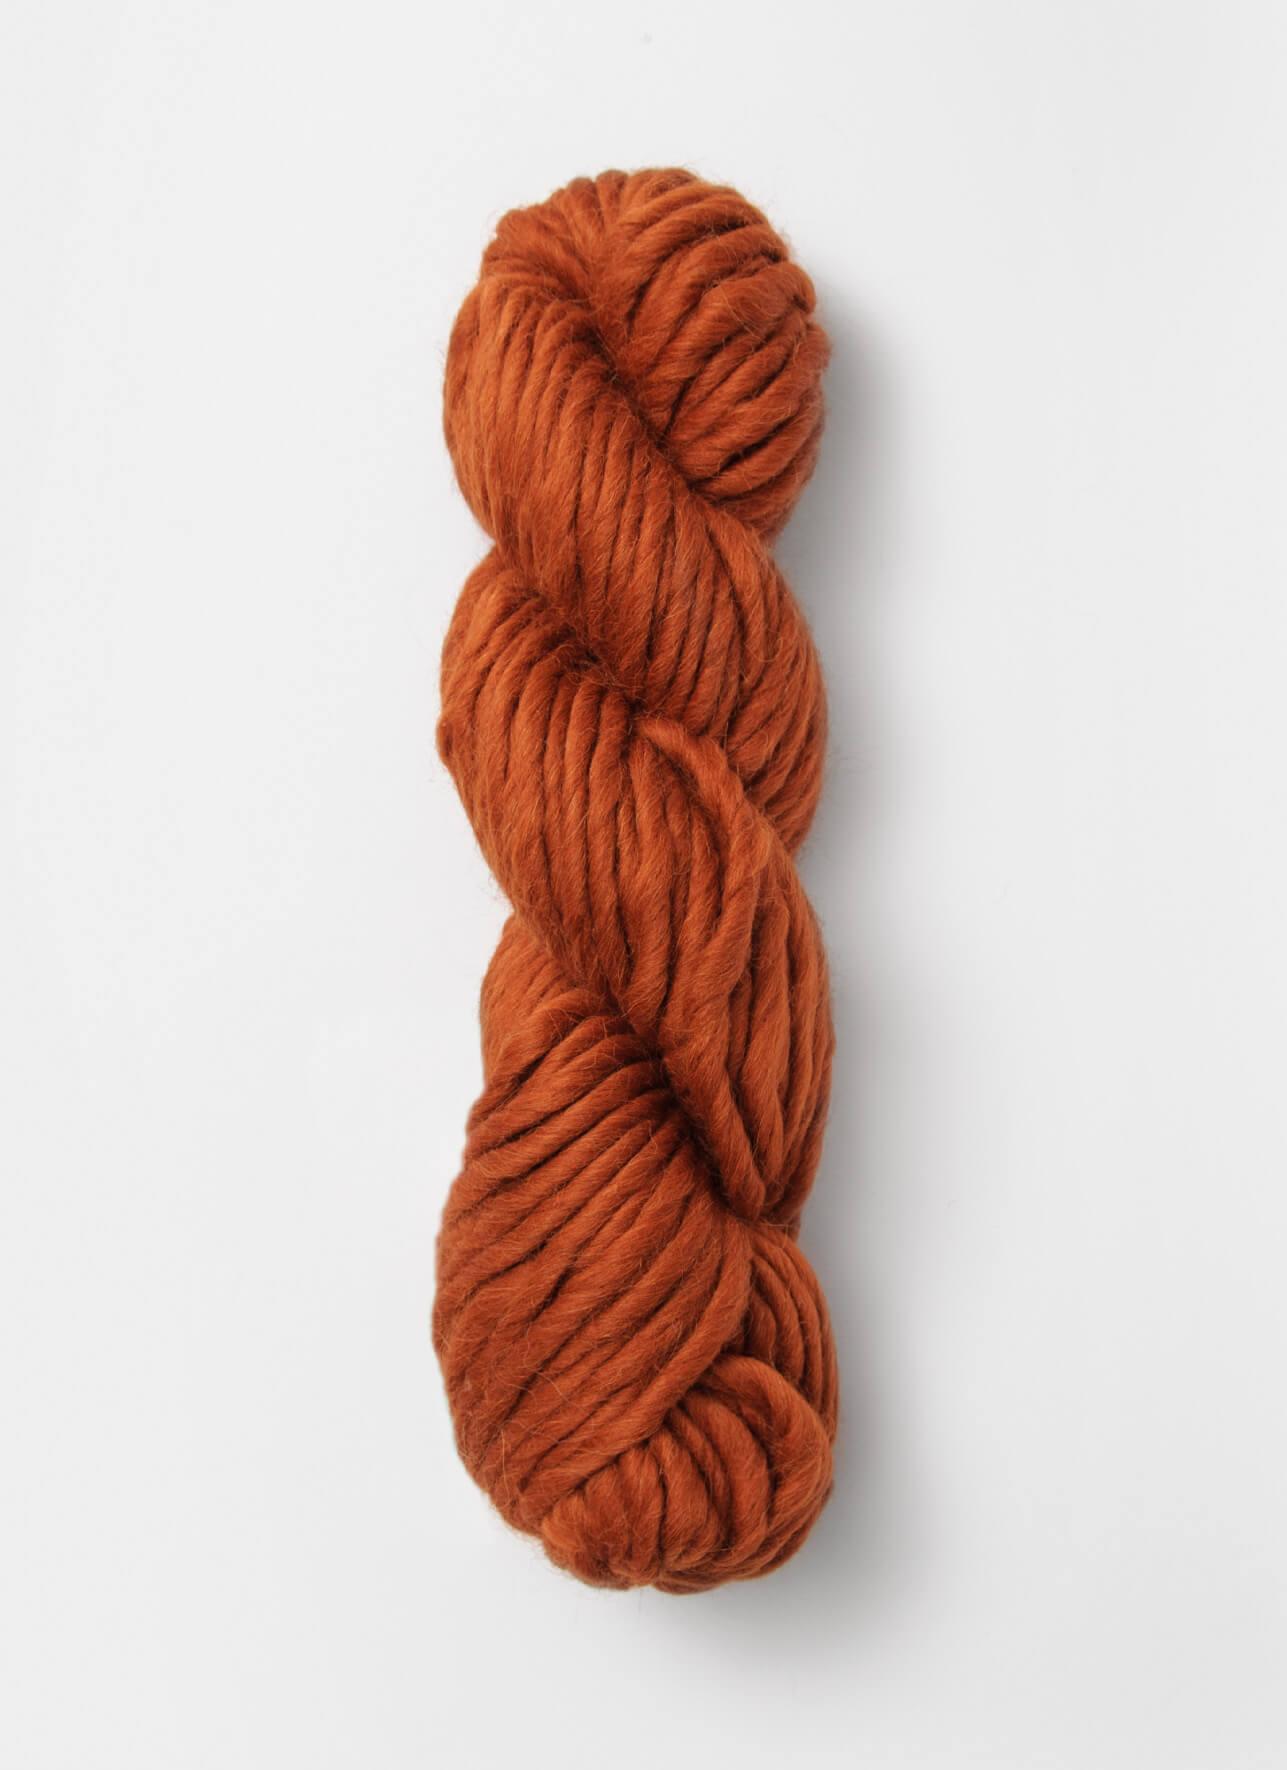 No. 1216: Cayenne